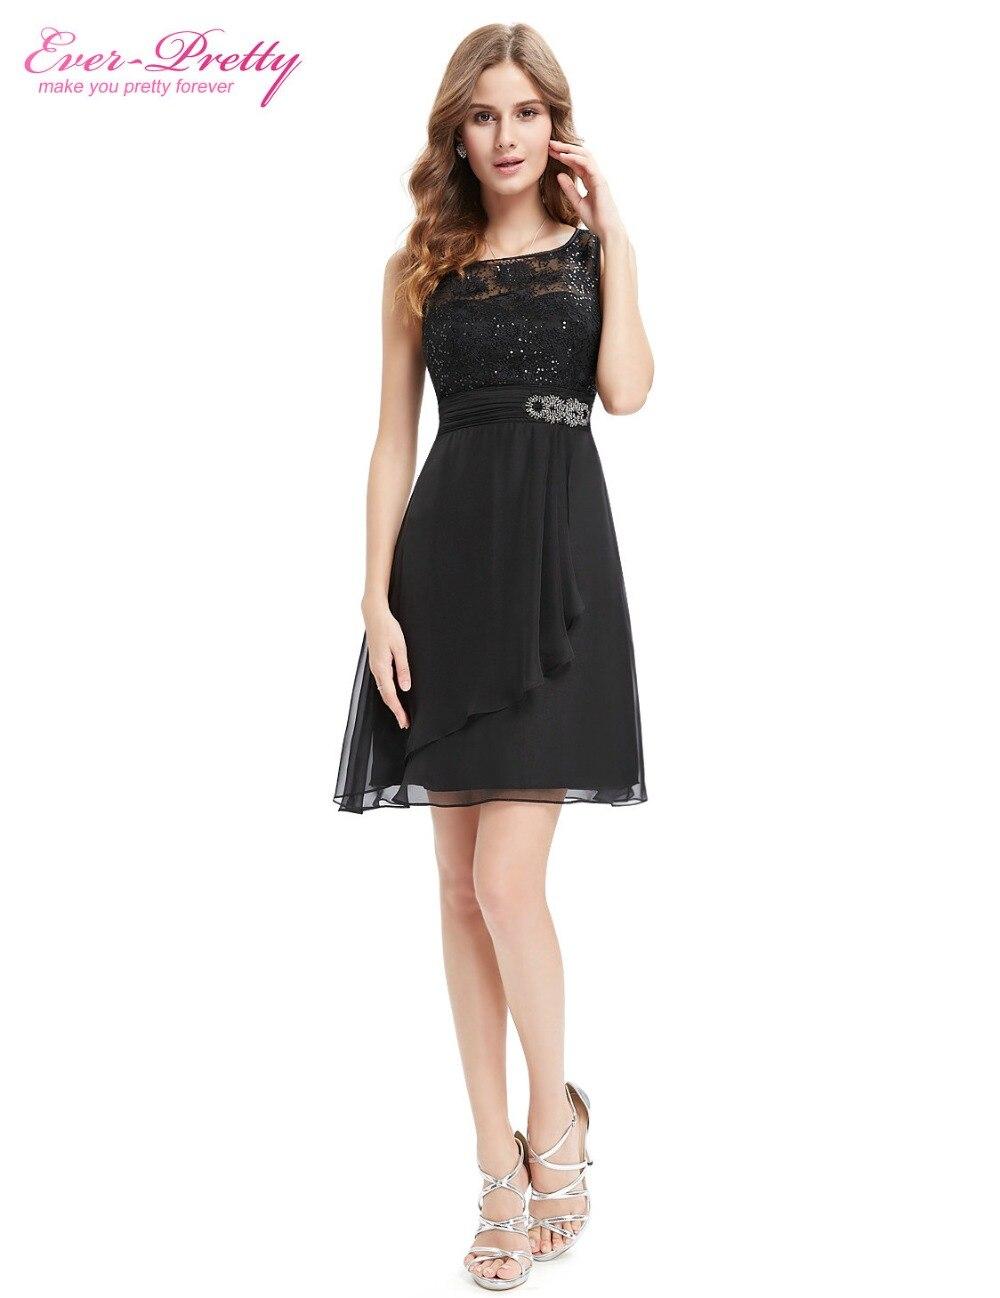 af244007fa170 Ever Pretty Cocktail Dresses AP05383BK Women Beautiful Cute Round Neck  Sleeveless Black Short Cocktail Dresses 2016 New Arrival-in Cocktail  Dresses ...